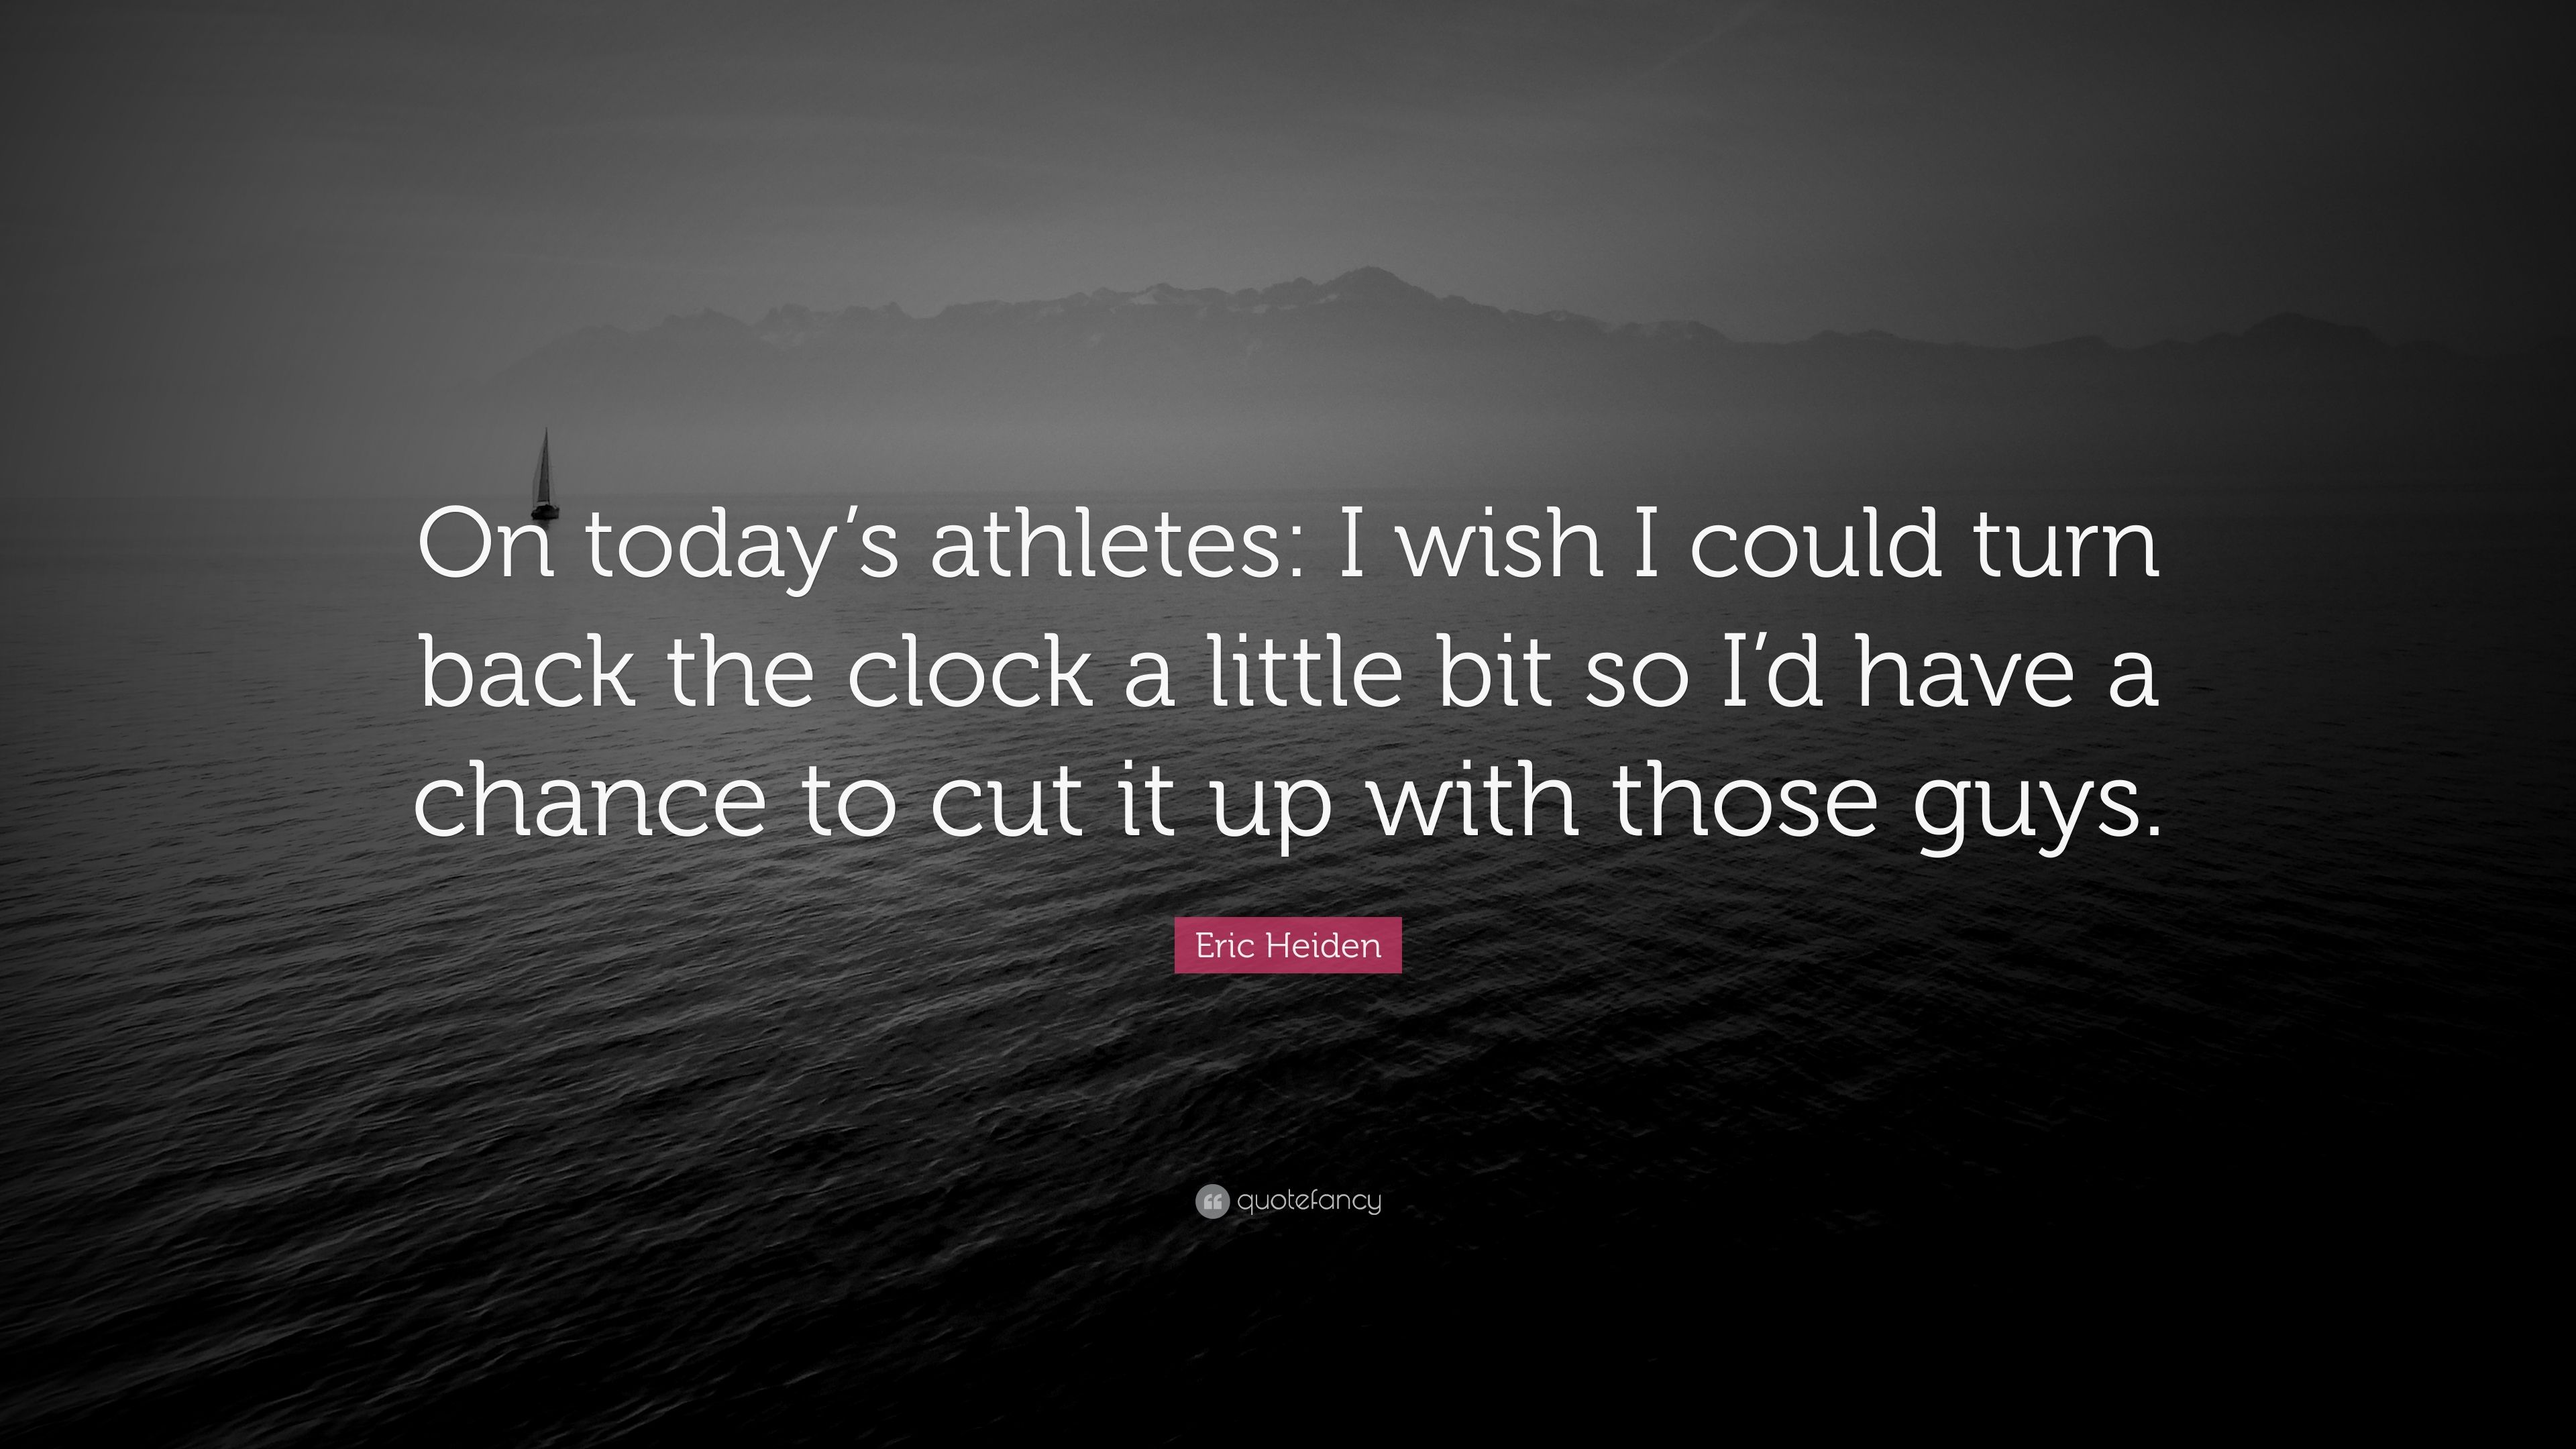 Eric Heiden Quote On Todays Athletes I Wish I Could Turn Back